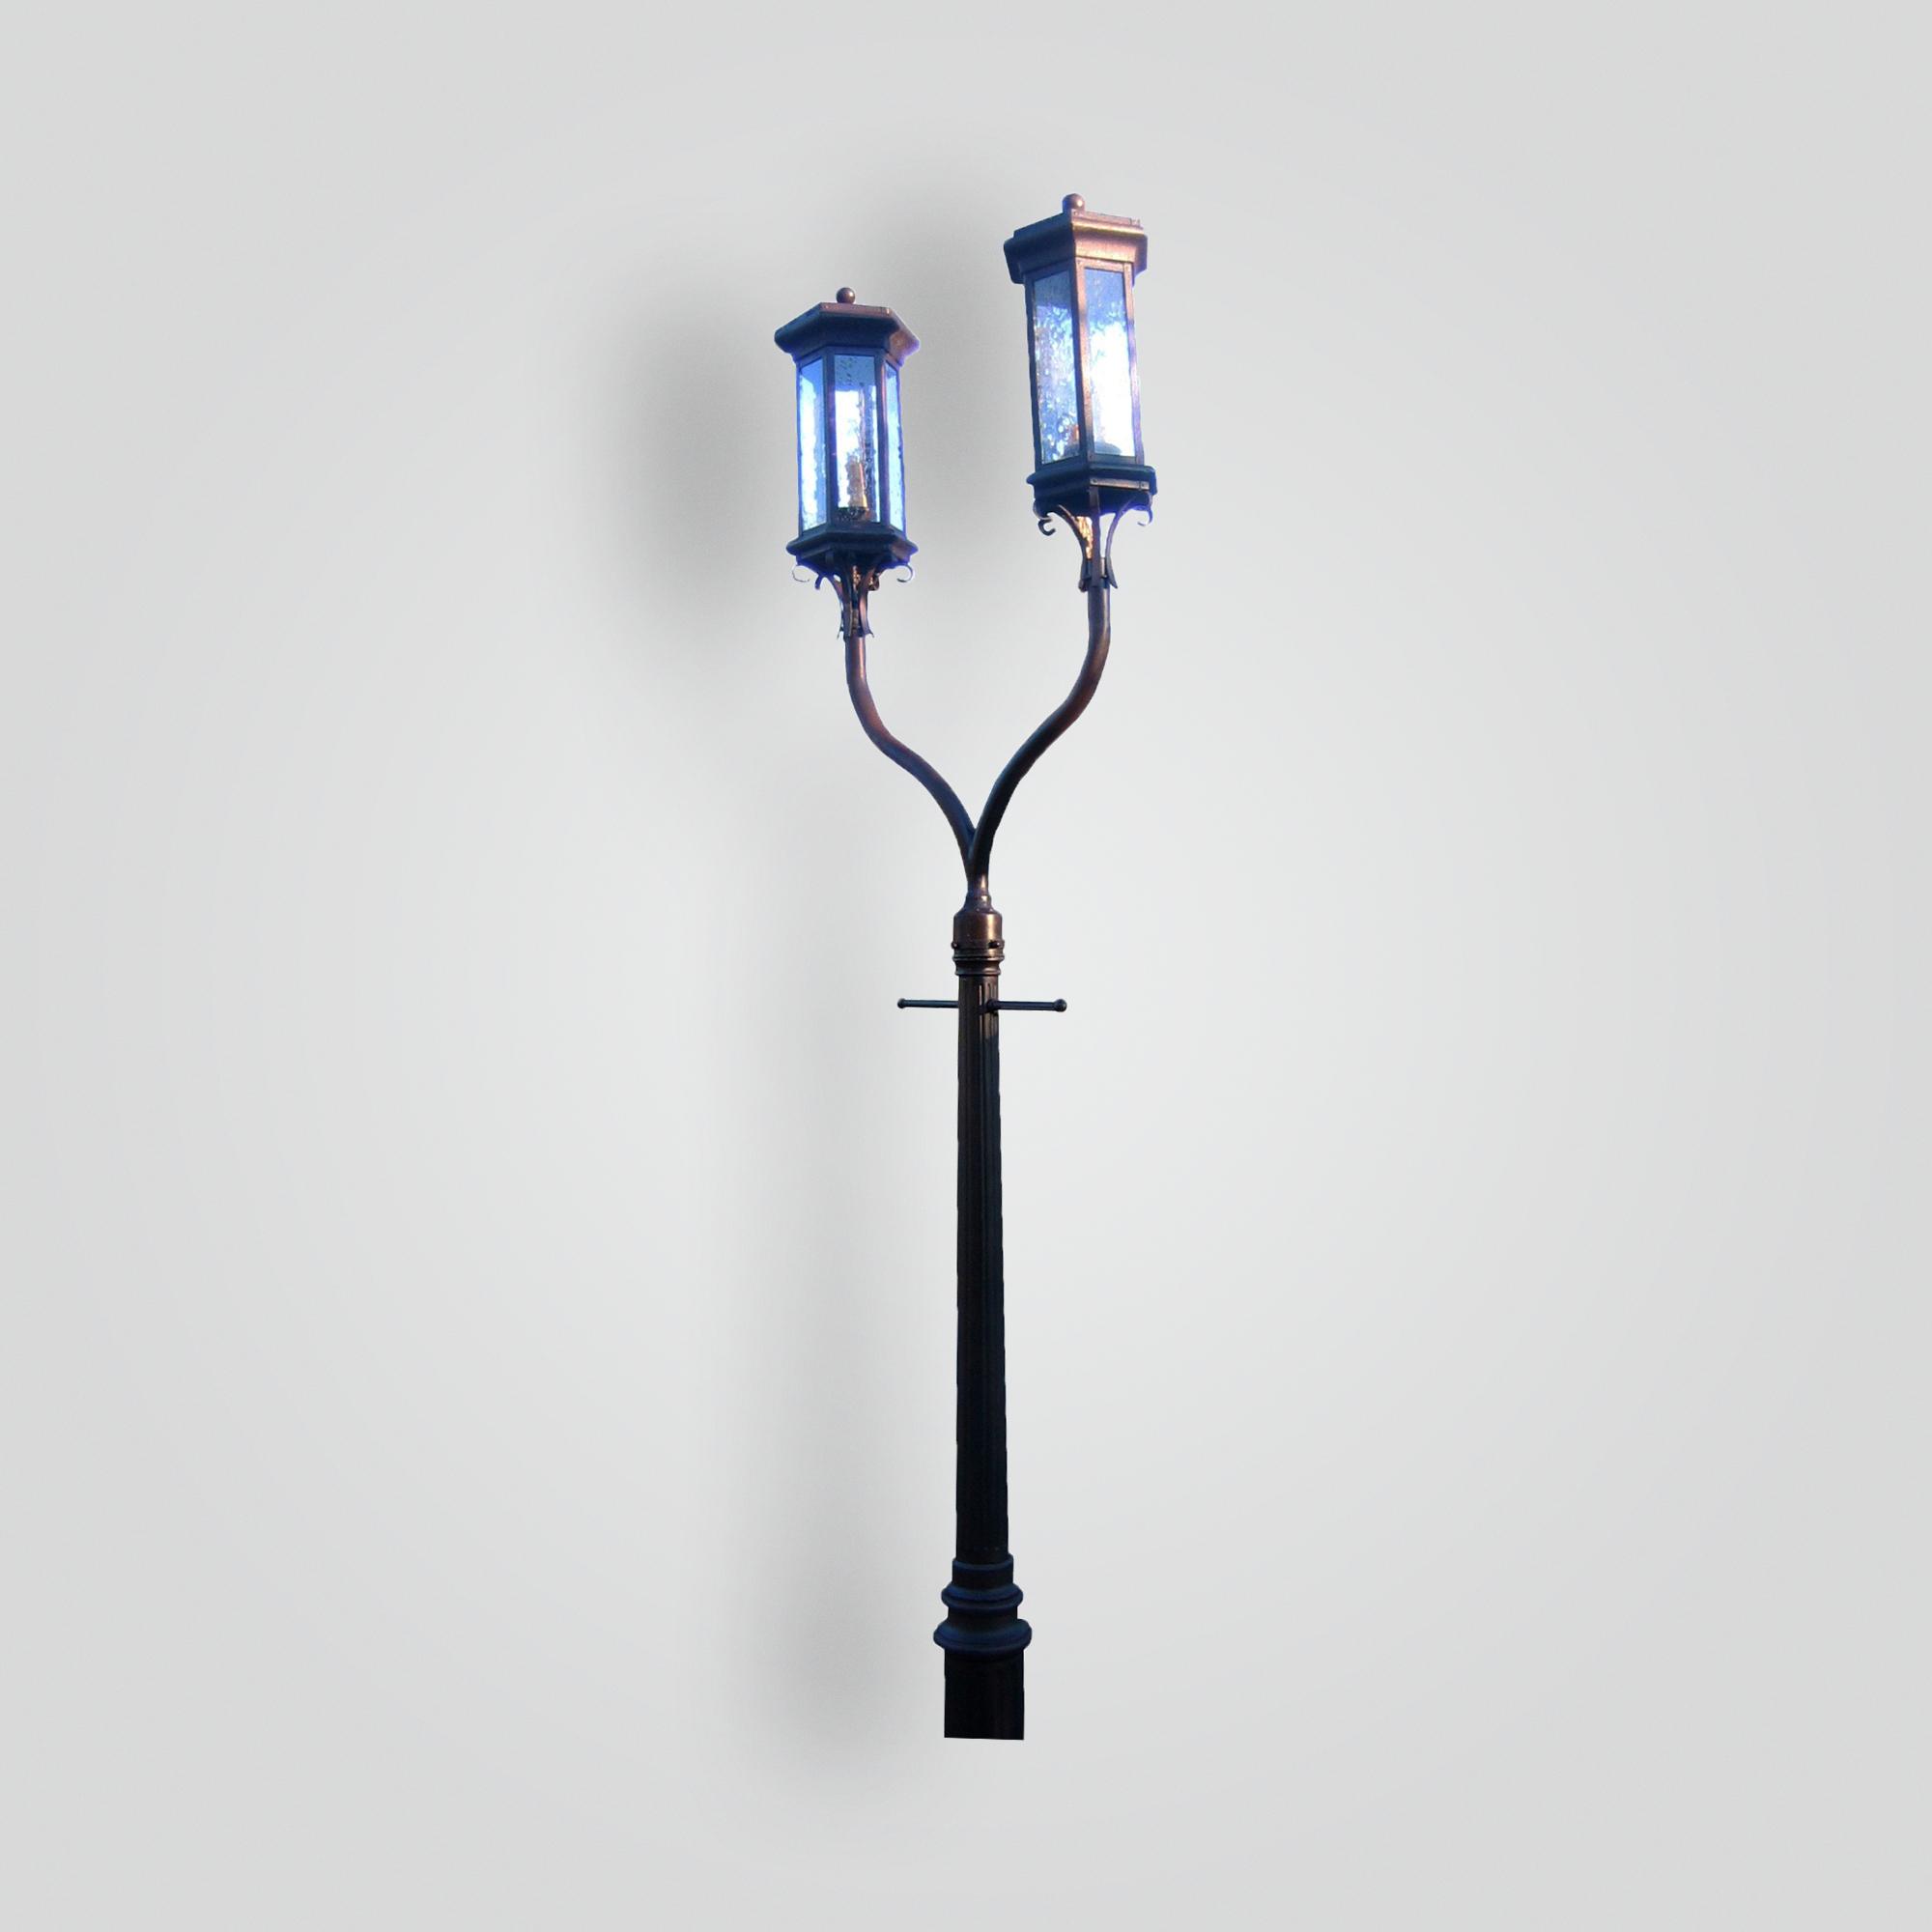 630-cb3-albr-p-shca 2-headed Lantern On Post – ADG Lighting Collection